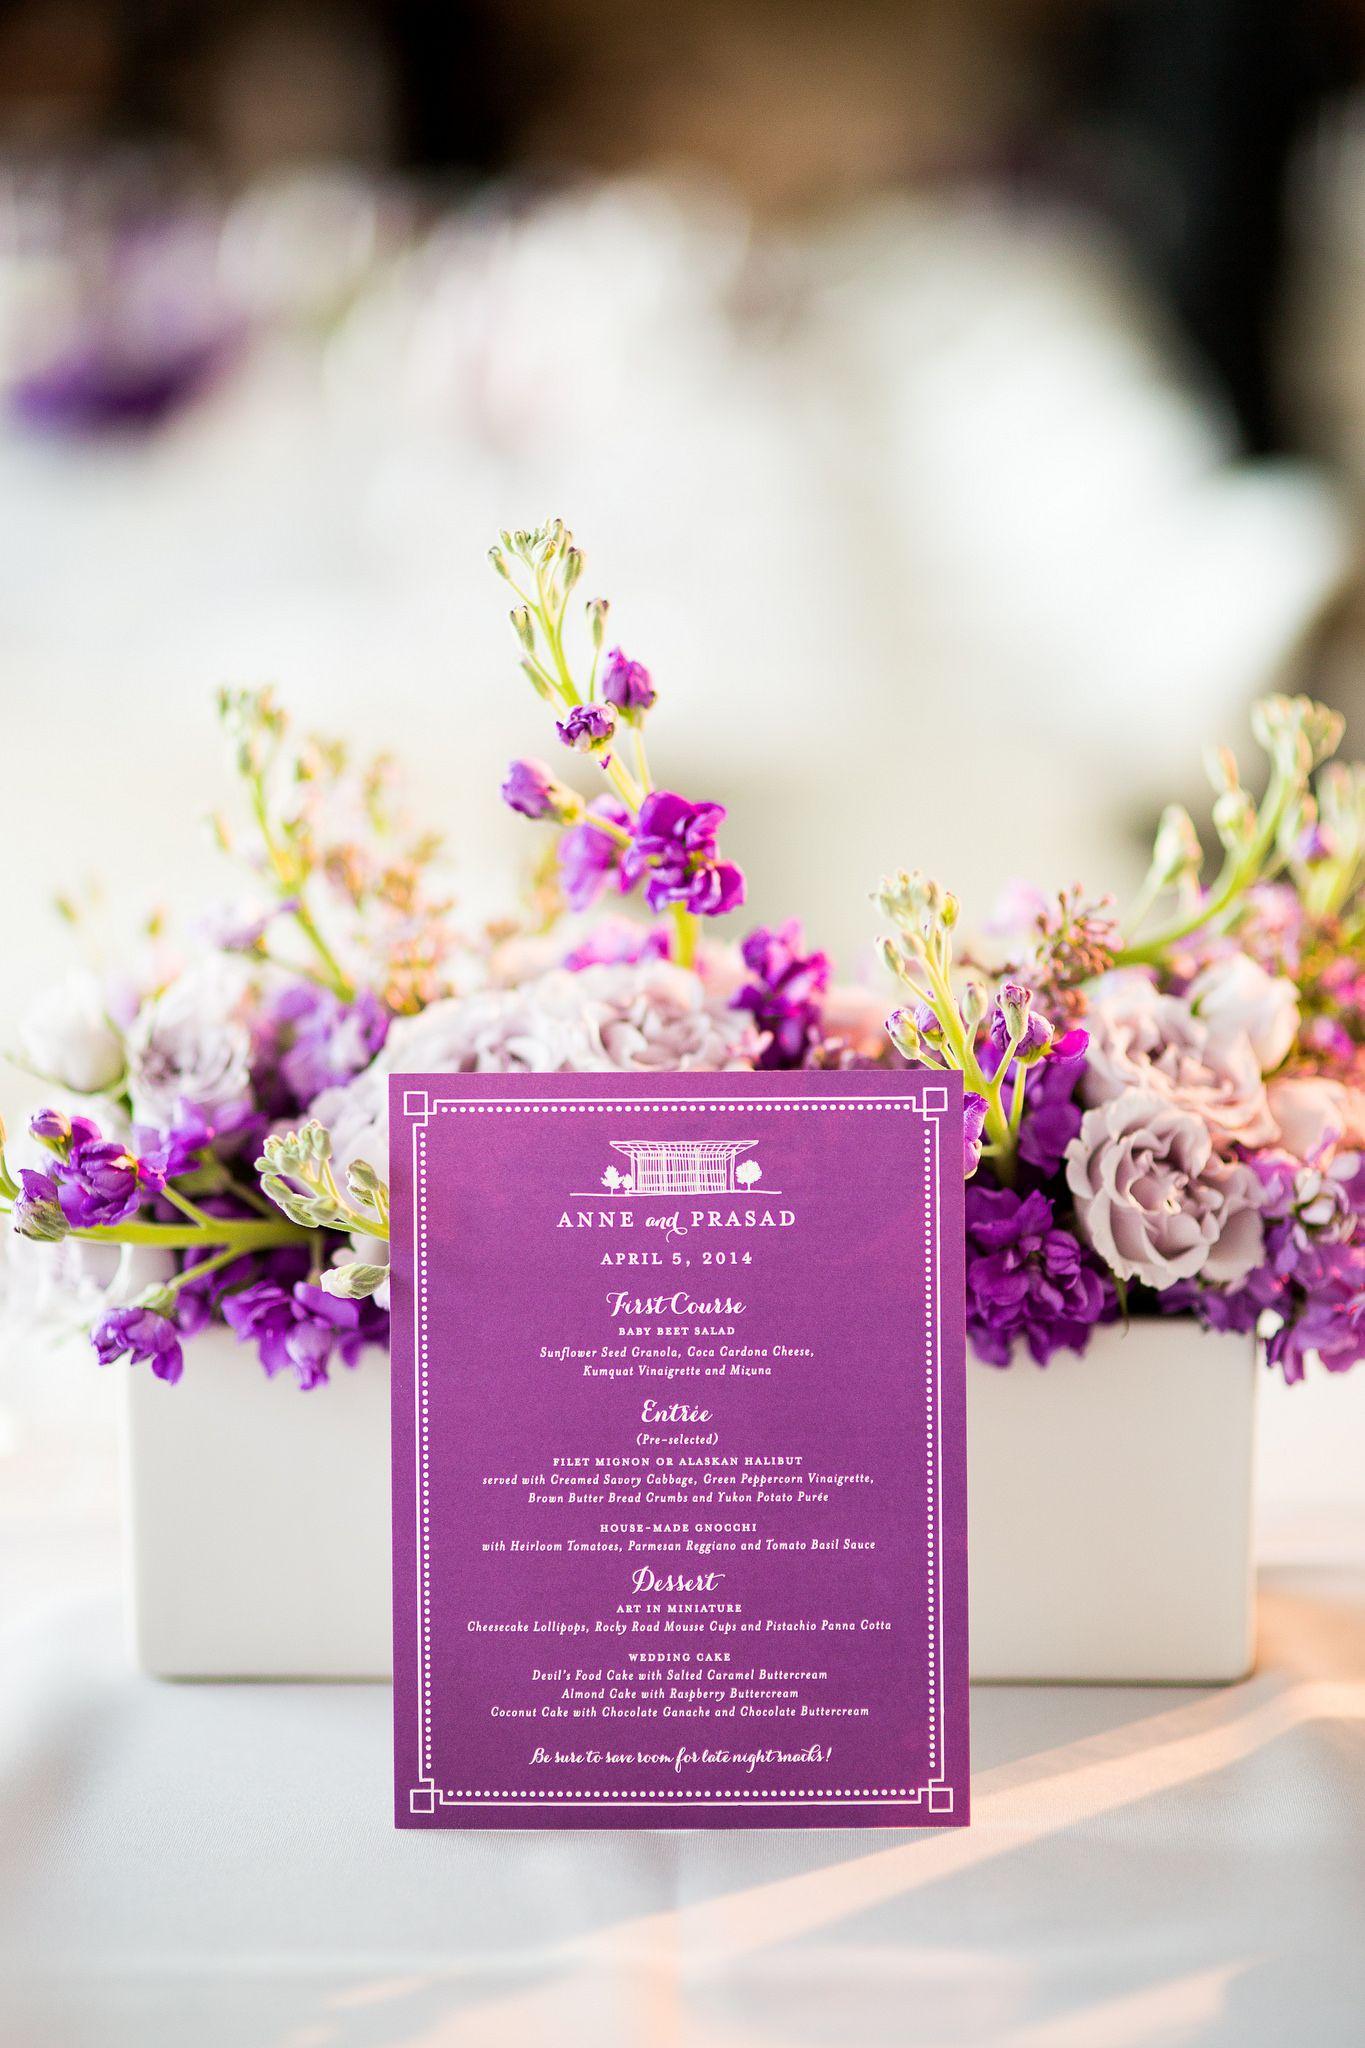 Perfect way to set up a wedding menu #blisschicago #weddings ...